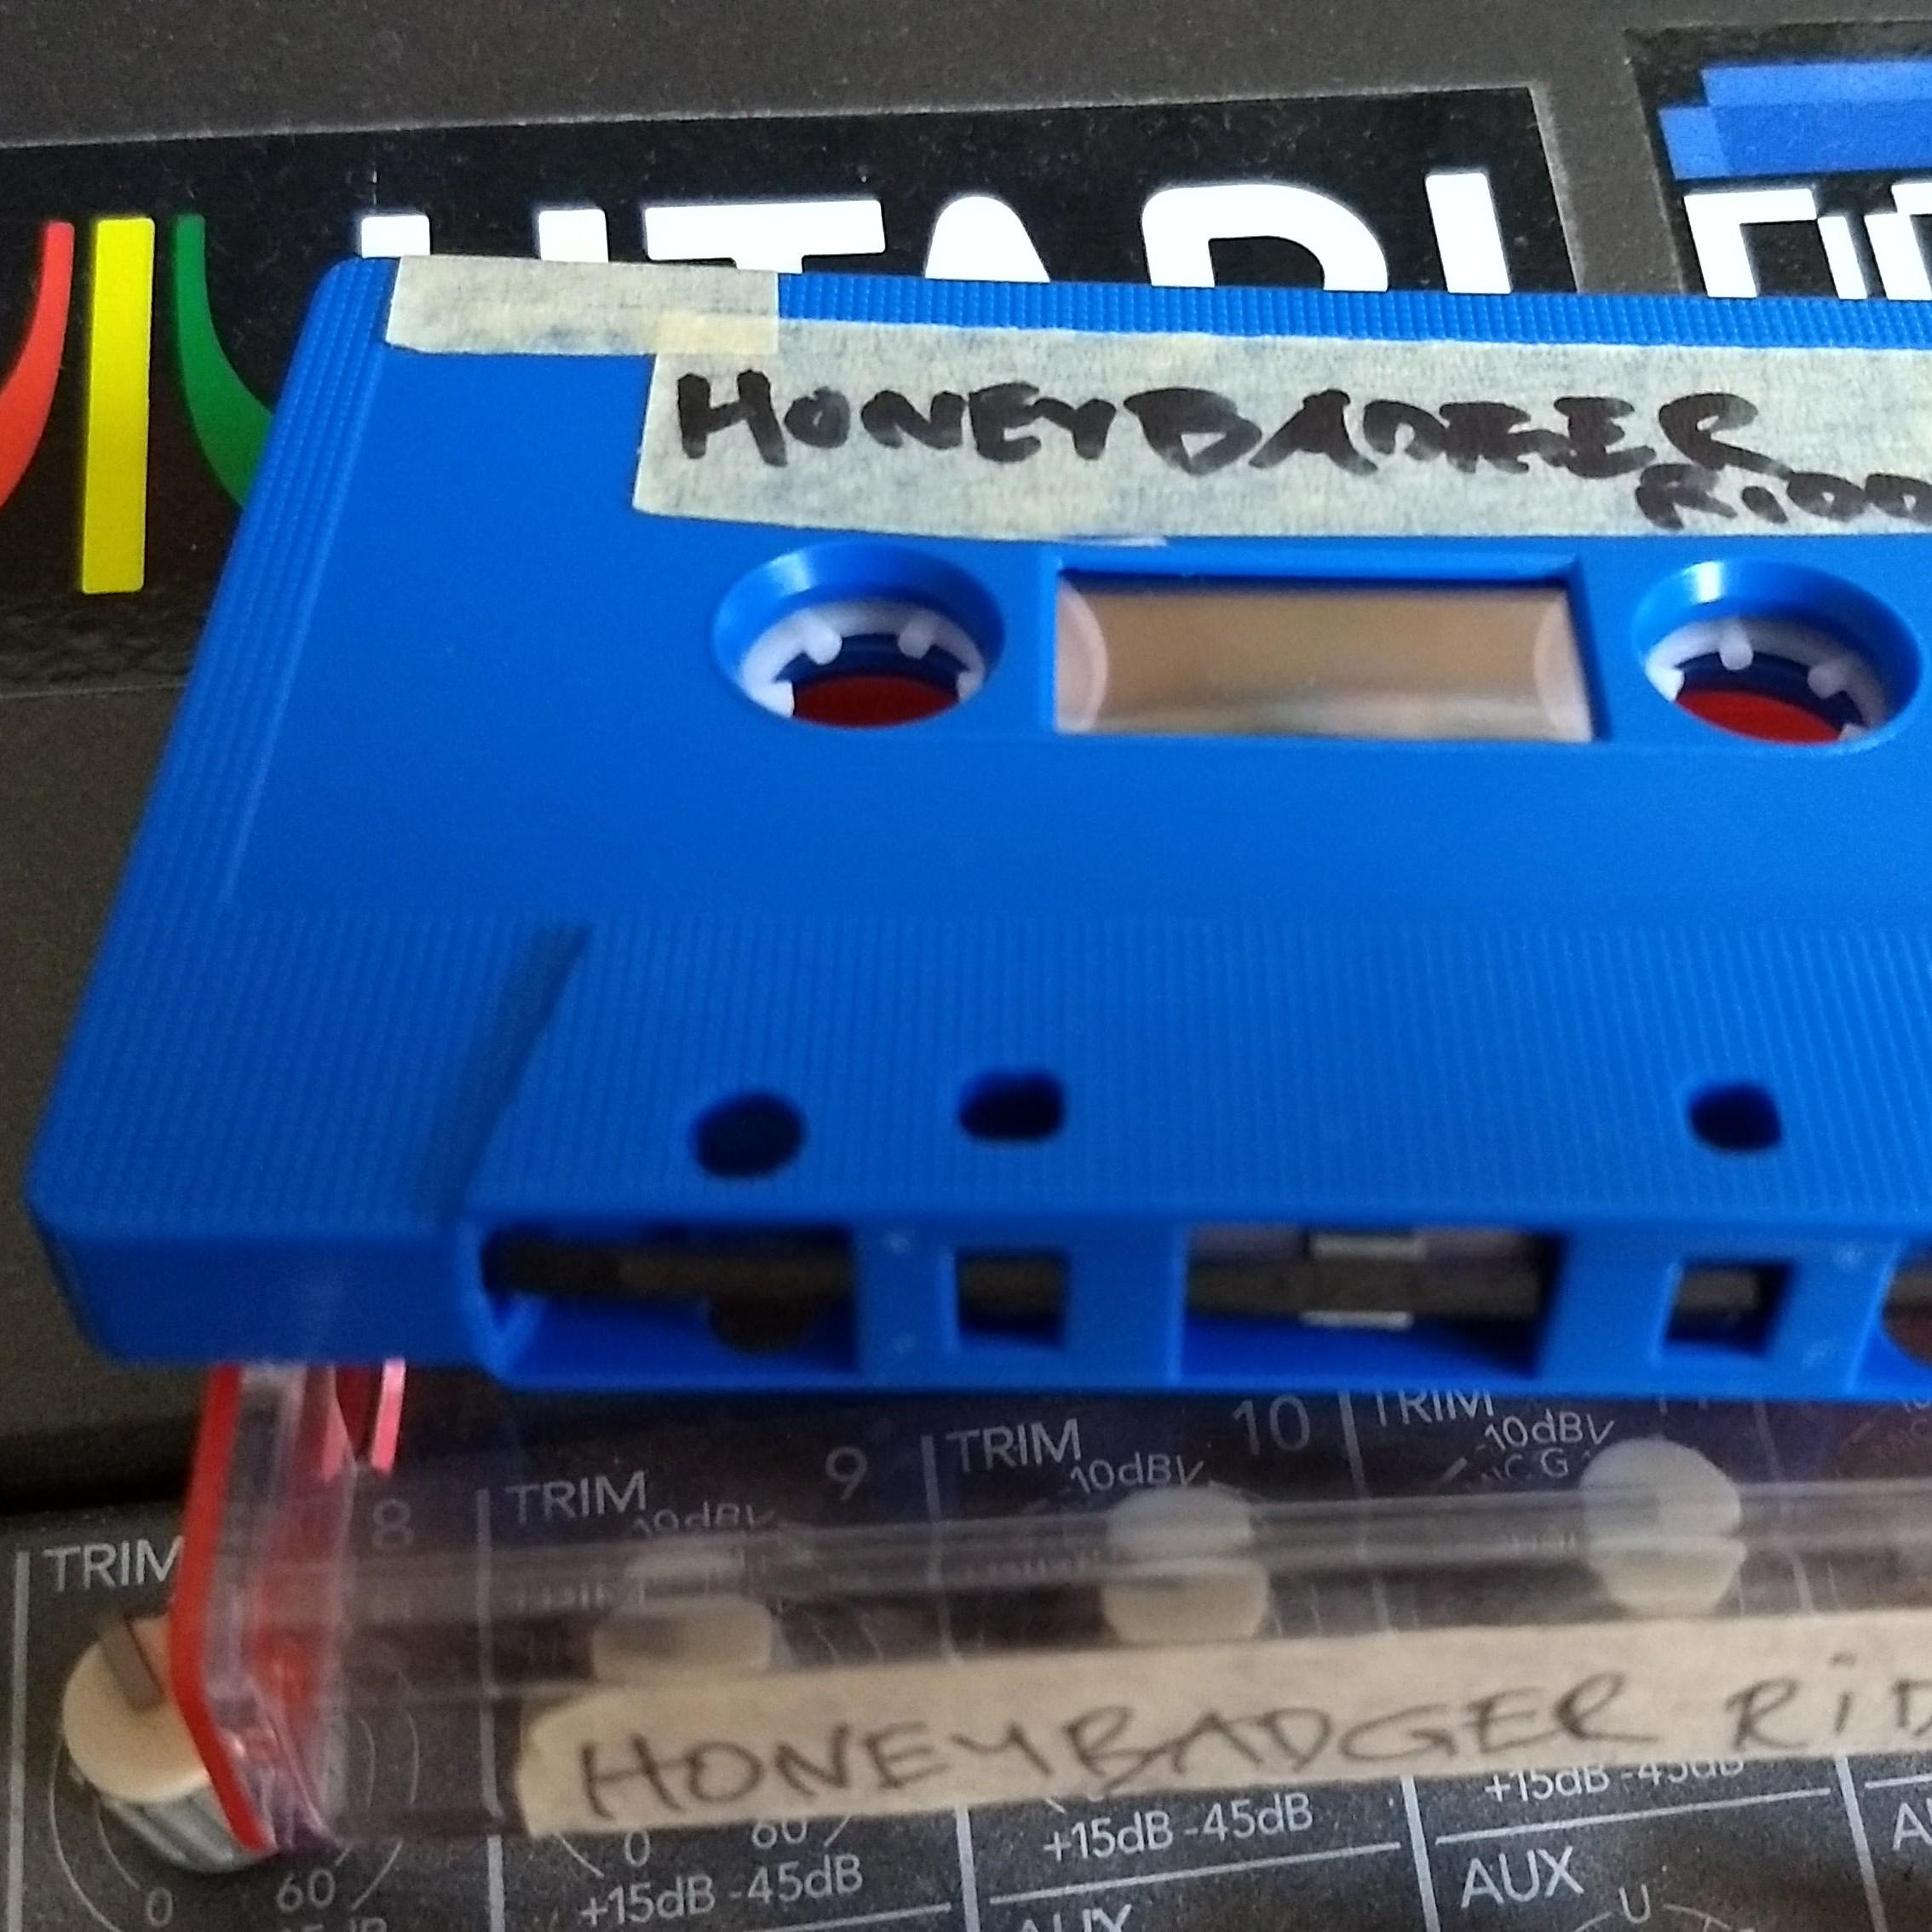 Peter King 7″ in the tube – jam from 8-track cassette